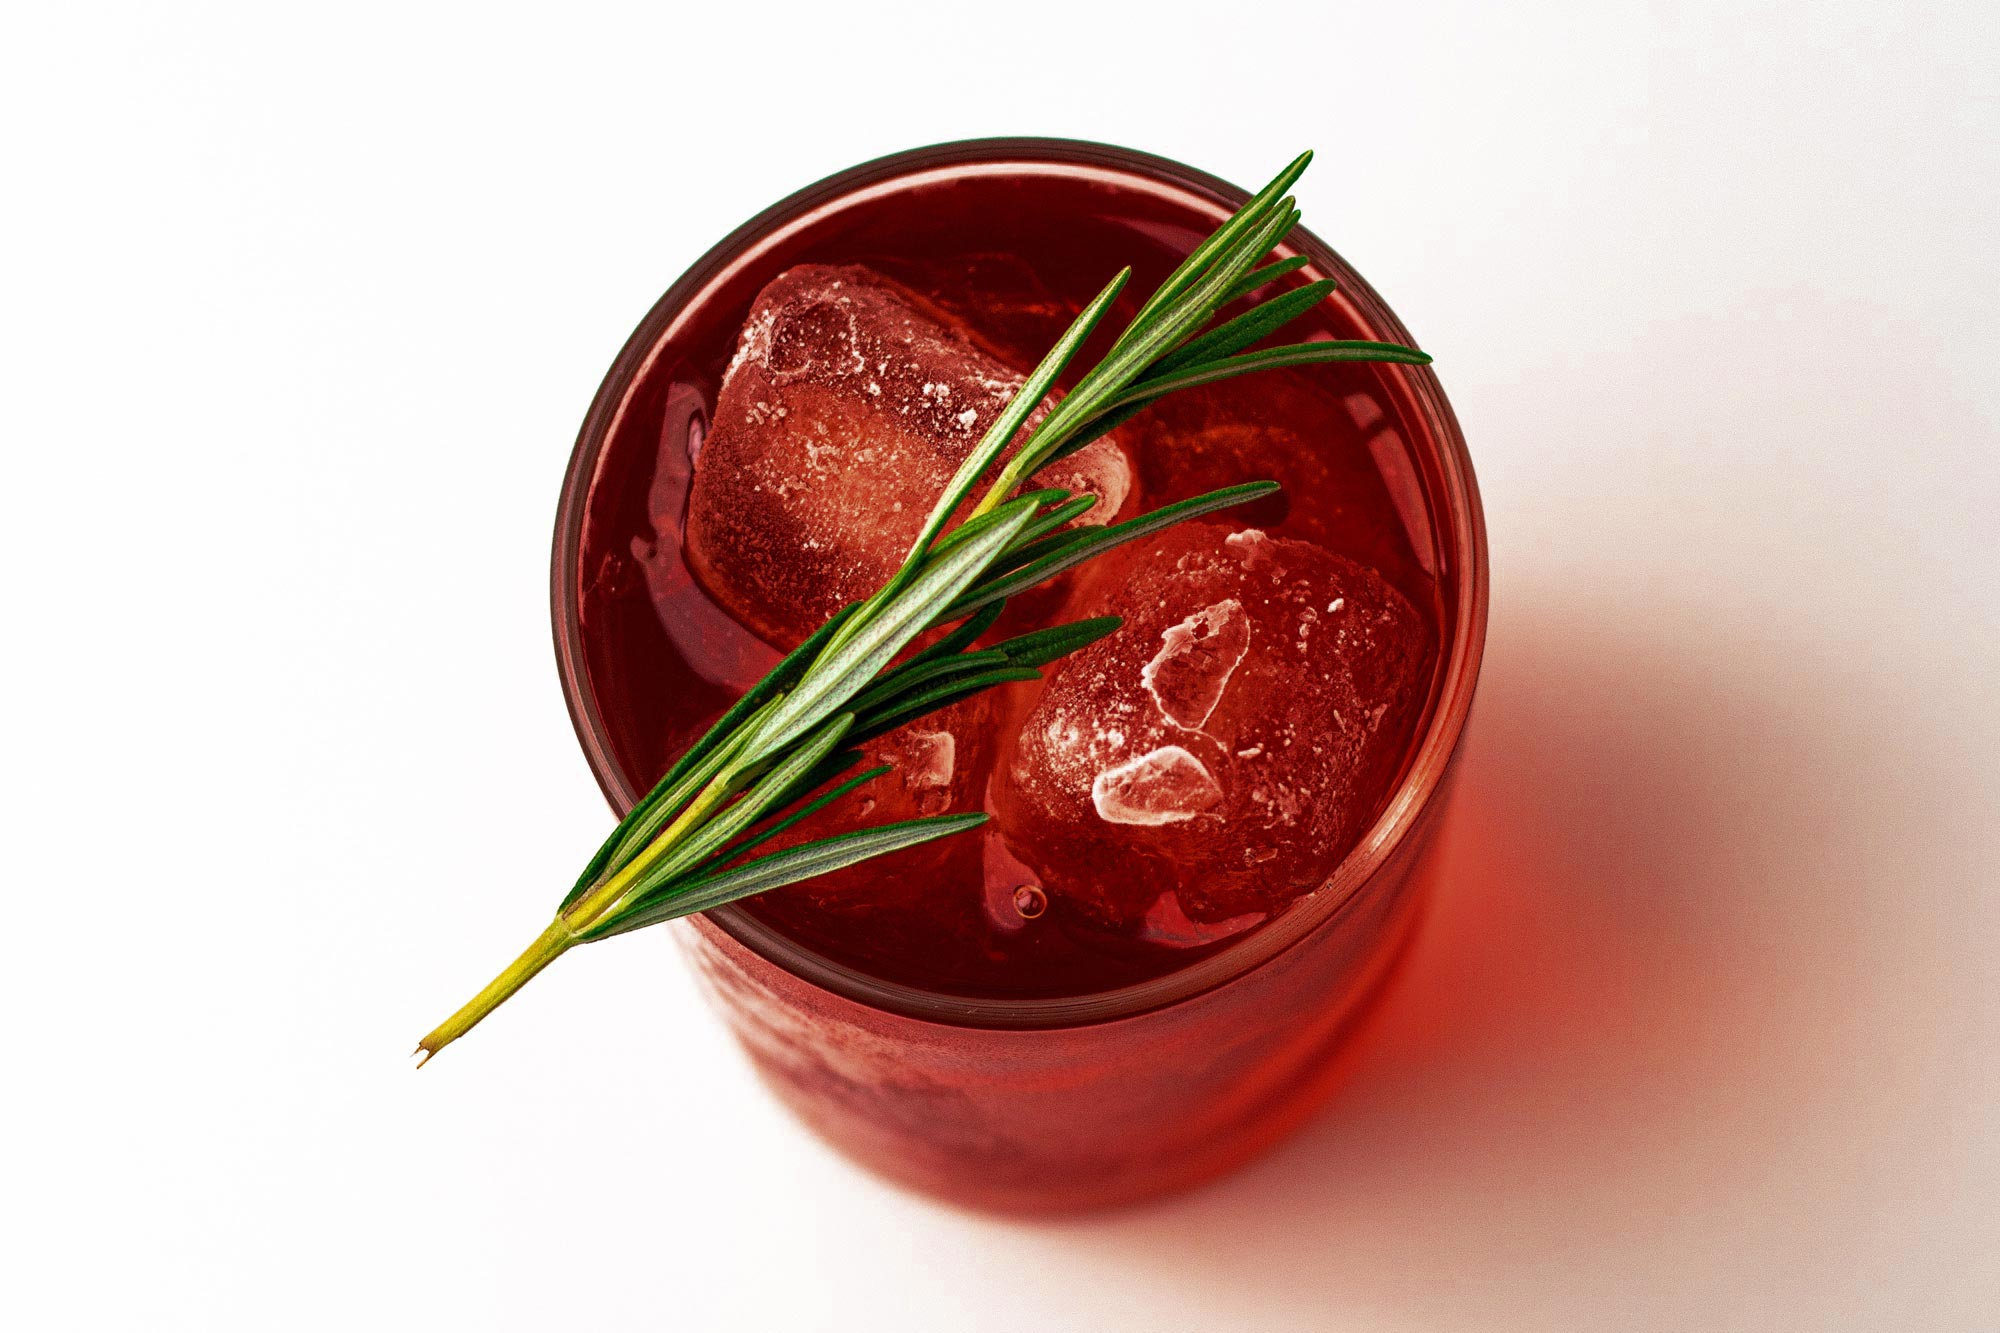 Bloody Rosemary koktel